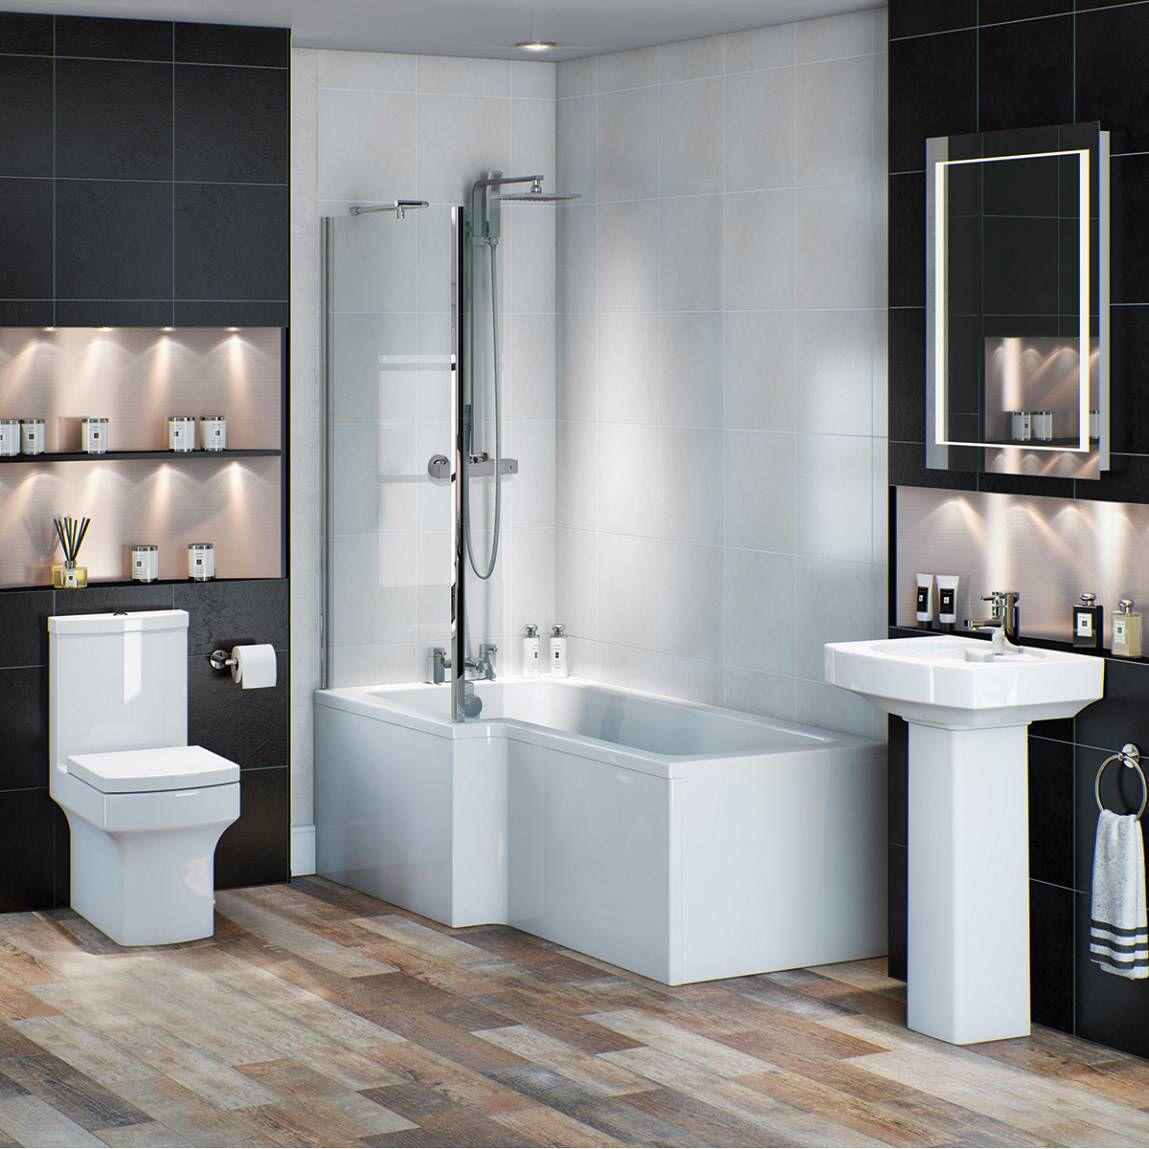 victoria plumb bathroom - Bathroom Accessories Victoria Plumb